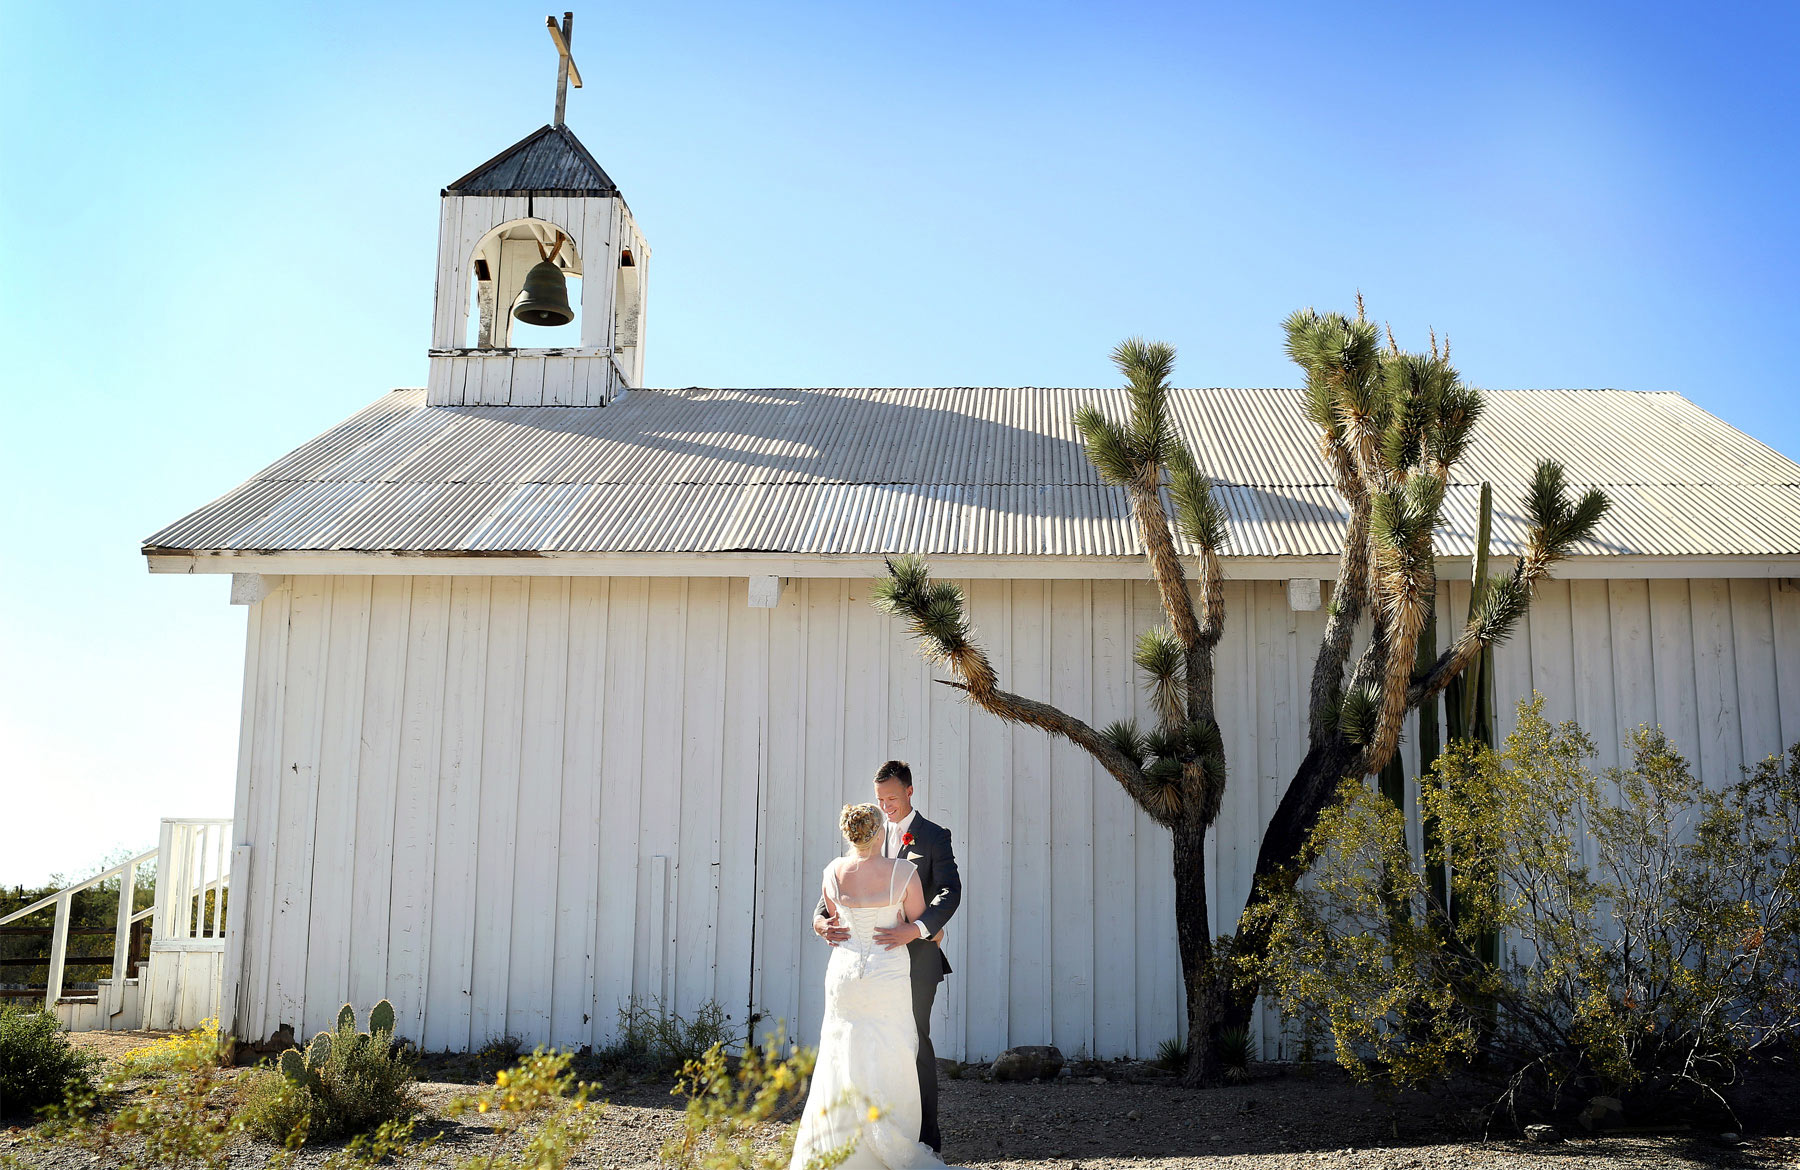 02-Tuscan-Arizona-Wedding-Photography-by-Vick-Photography-Destination-Wedding-Desert-Old-Tucson-Studios-Cactus.jpg